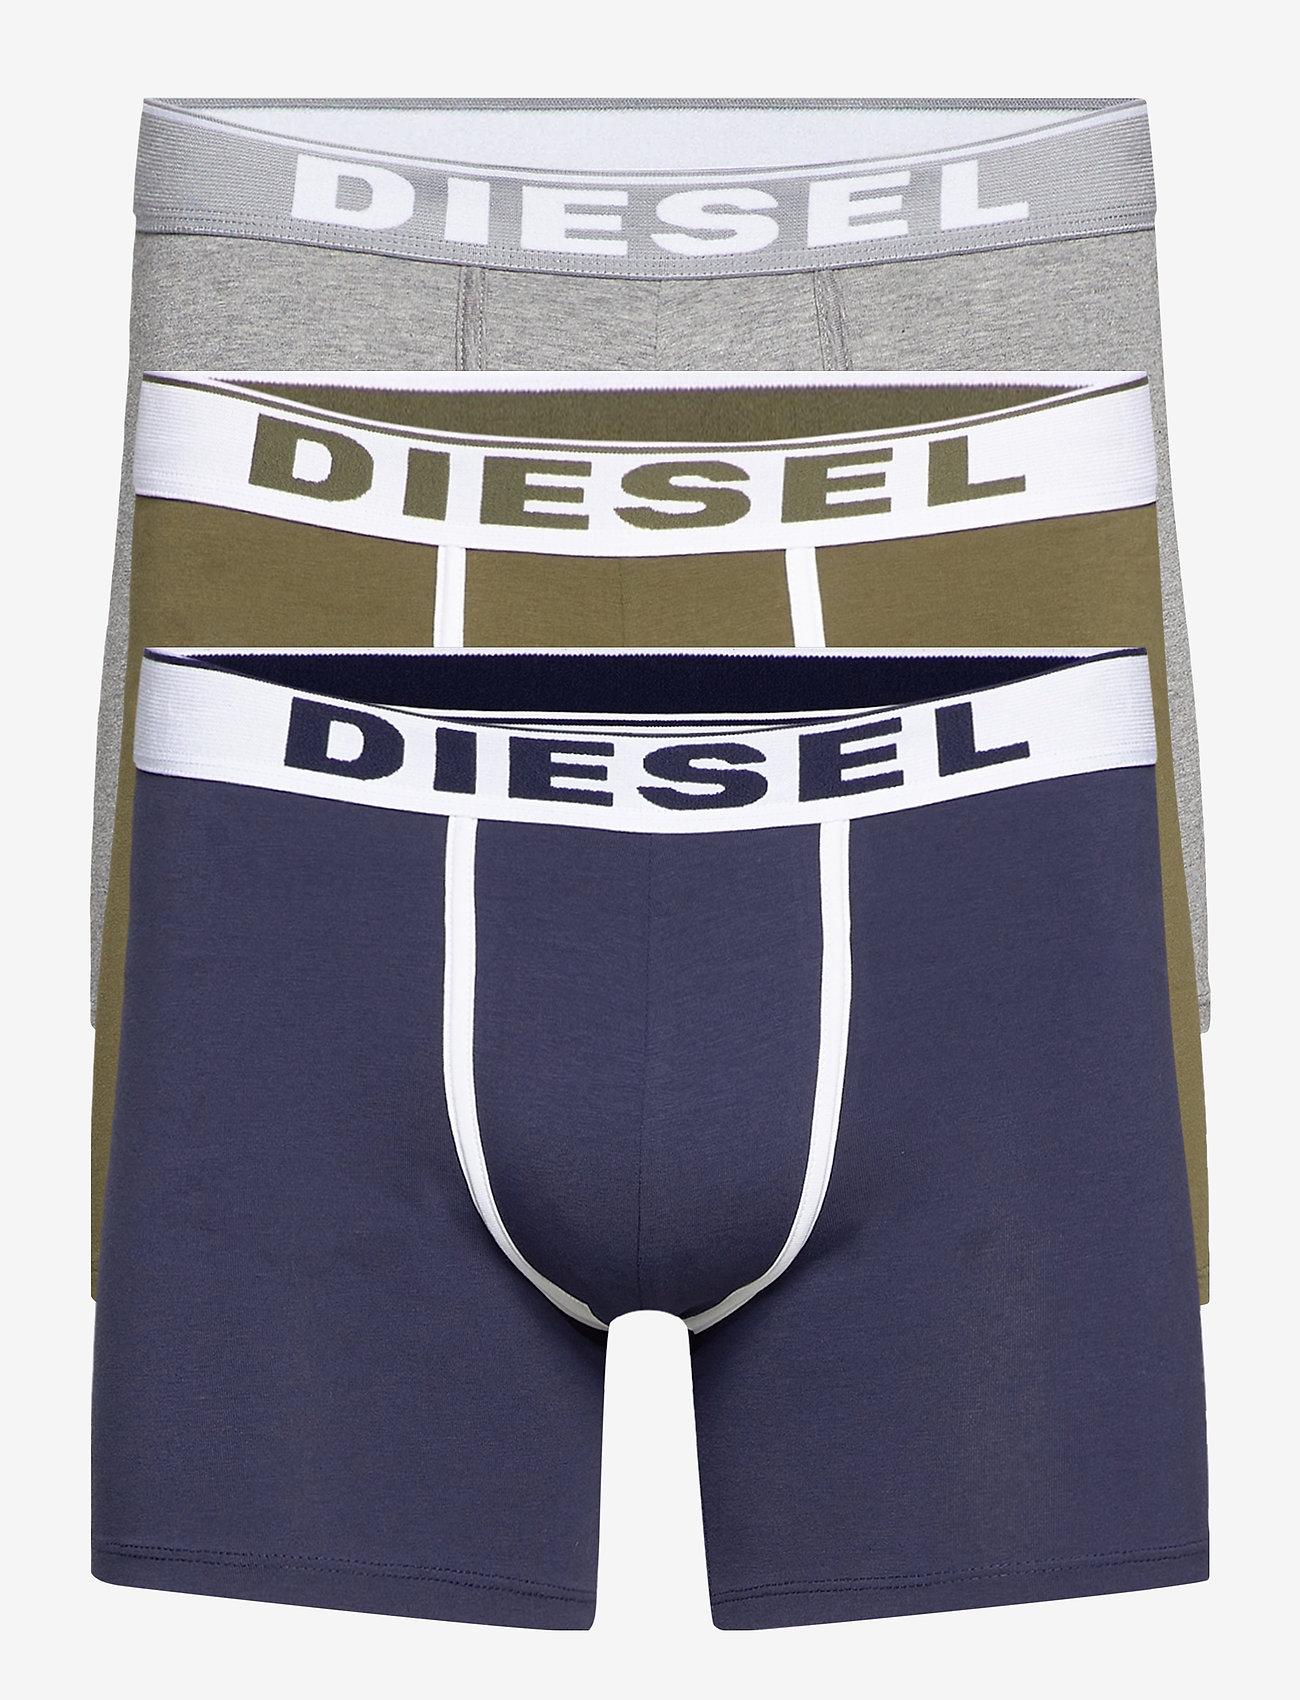 Diesel Men - UMBX-SEBASTIANTHREEPAC BOXER-SHORTS - boxers - ah51f+ah8at+ah96x - 0